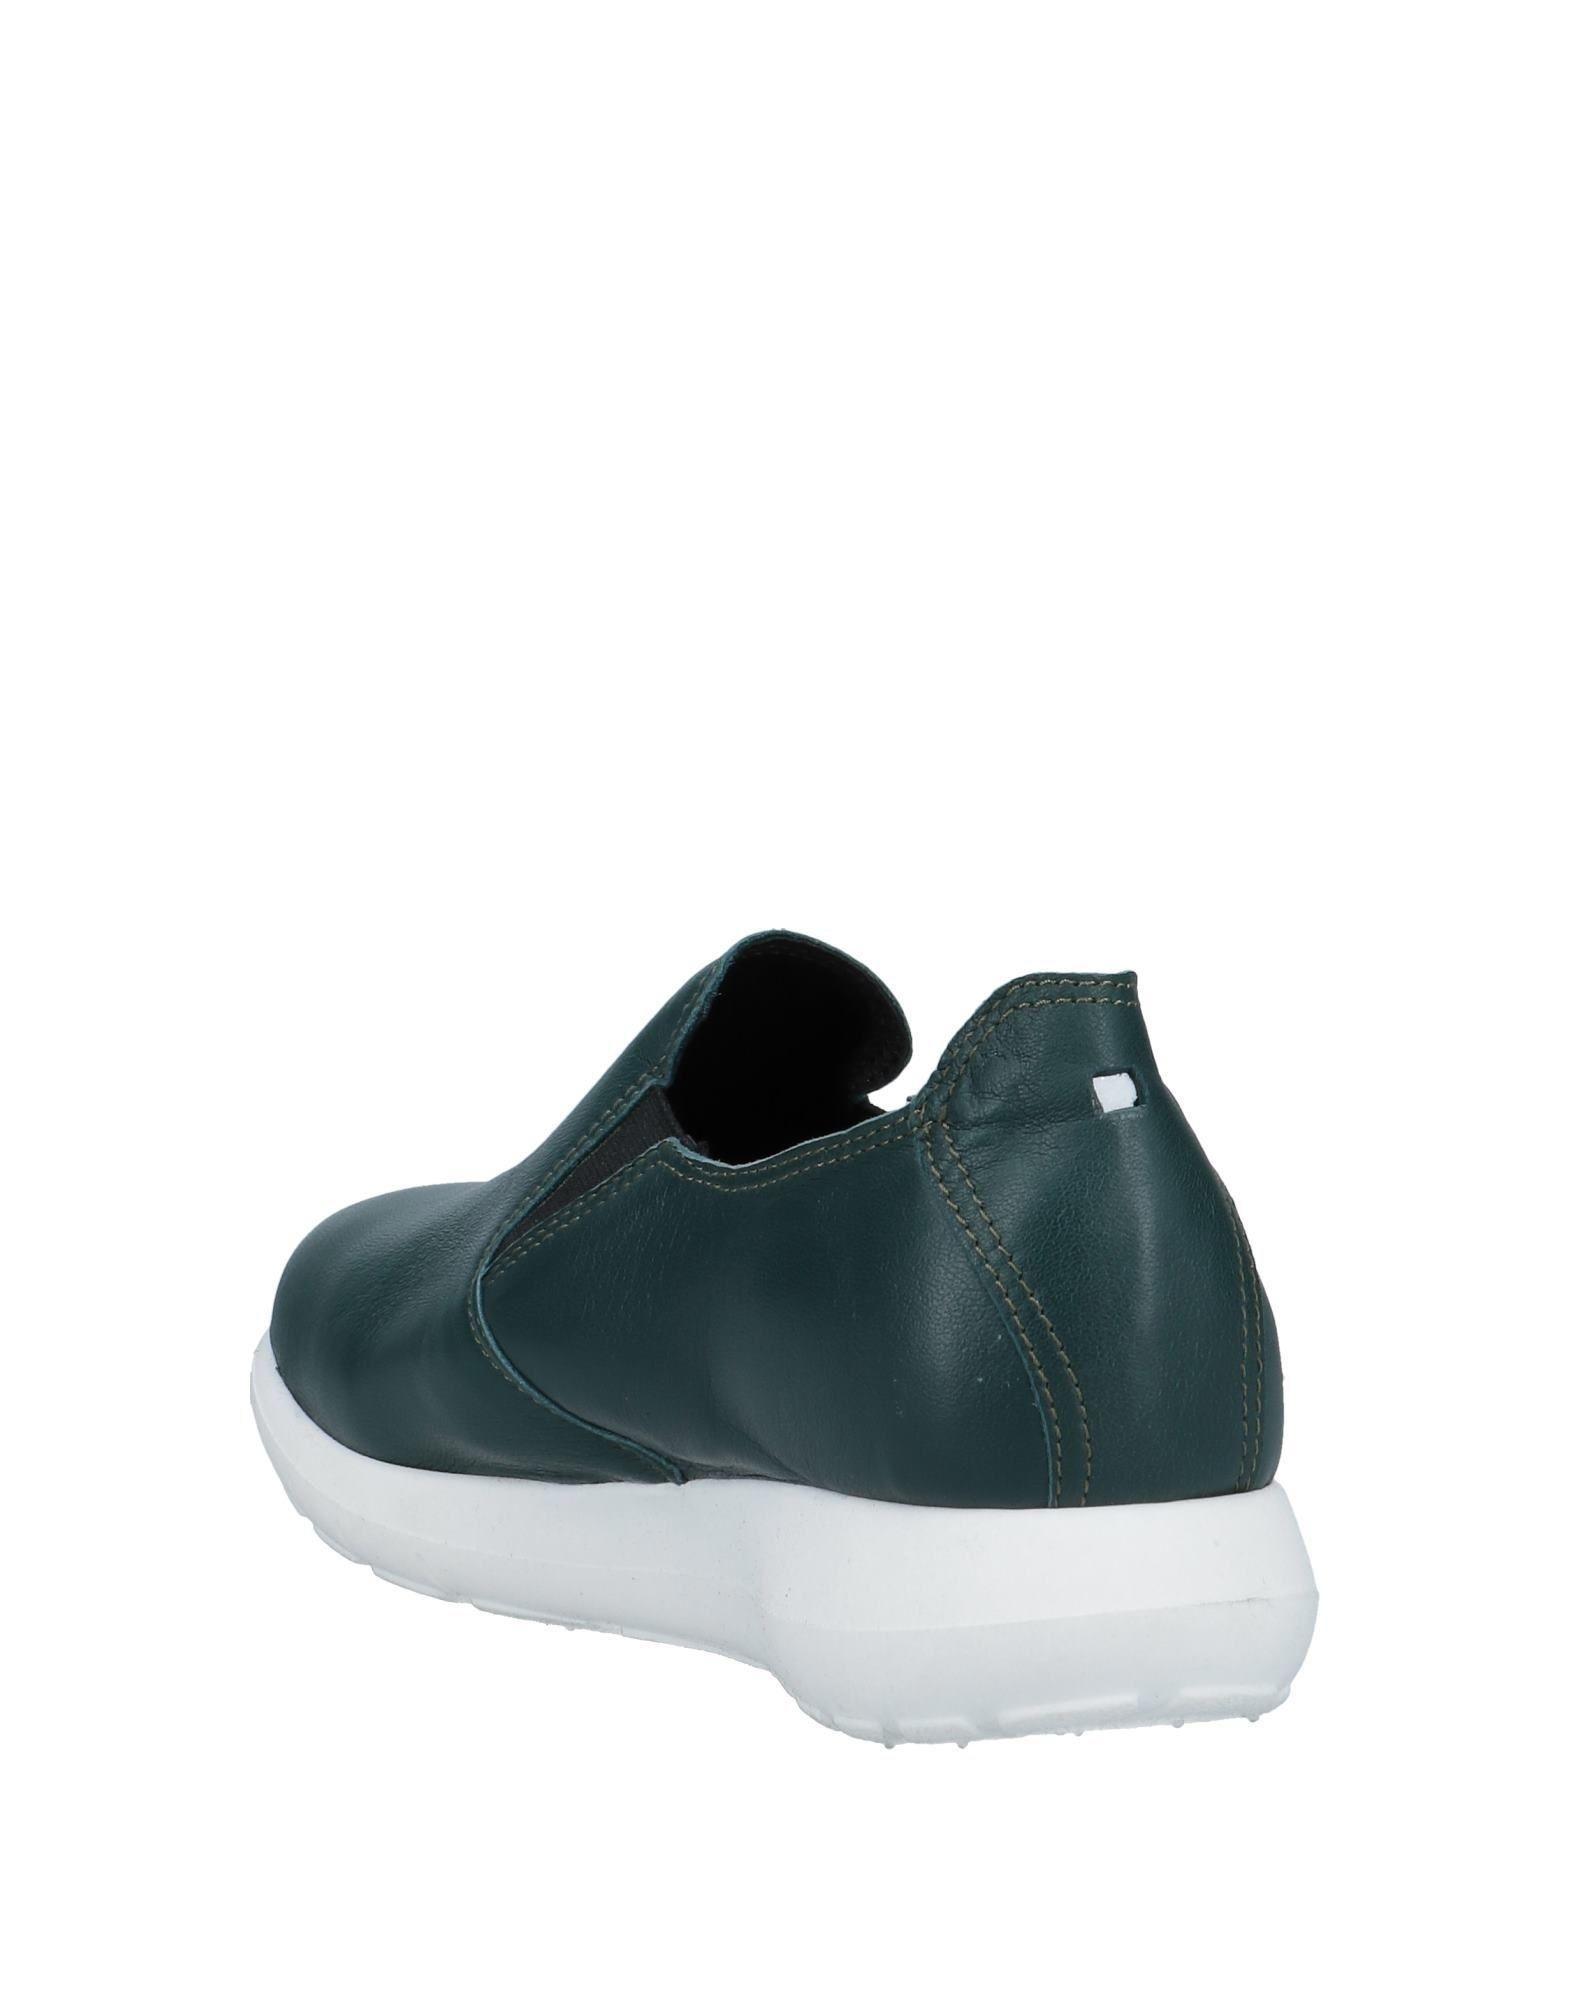 Sneakers & Tennis basses Cuir Collection Privée en coloris Vert 8sVD